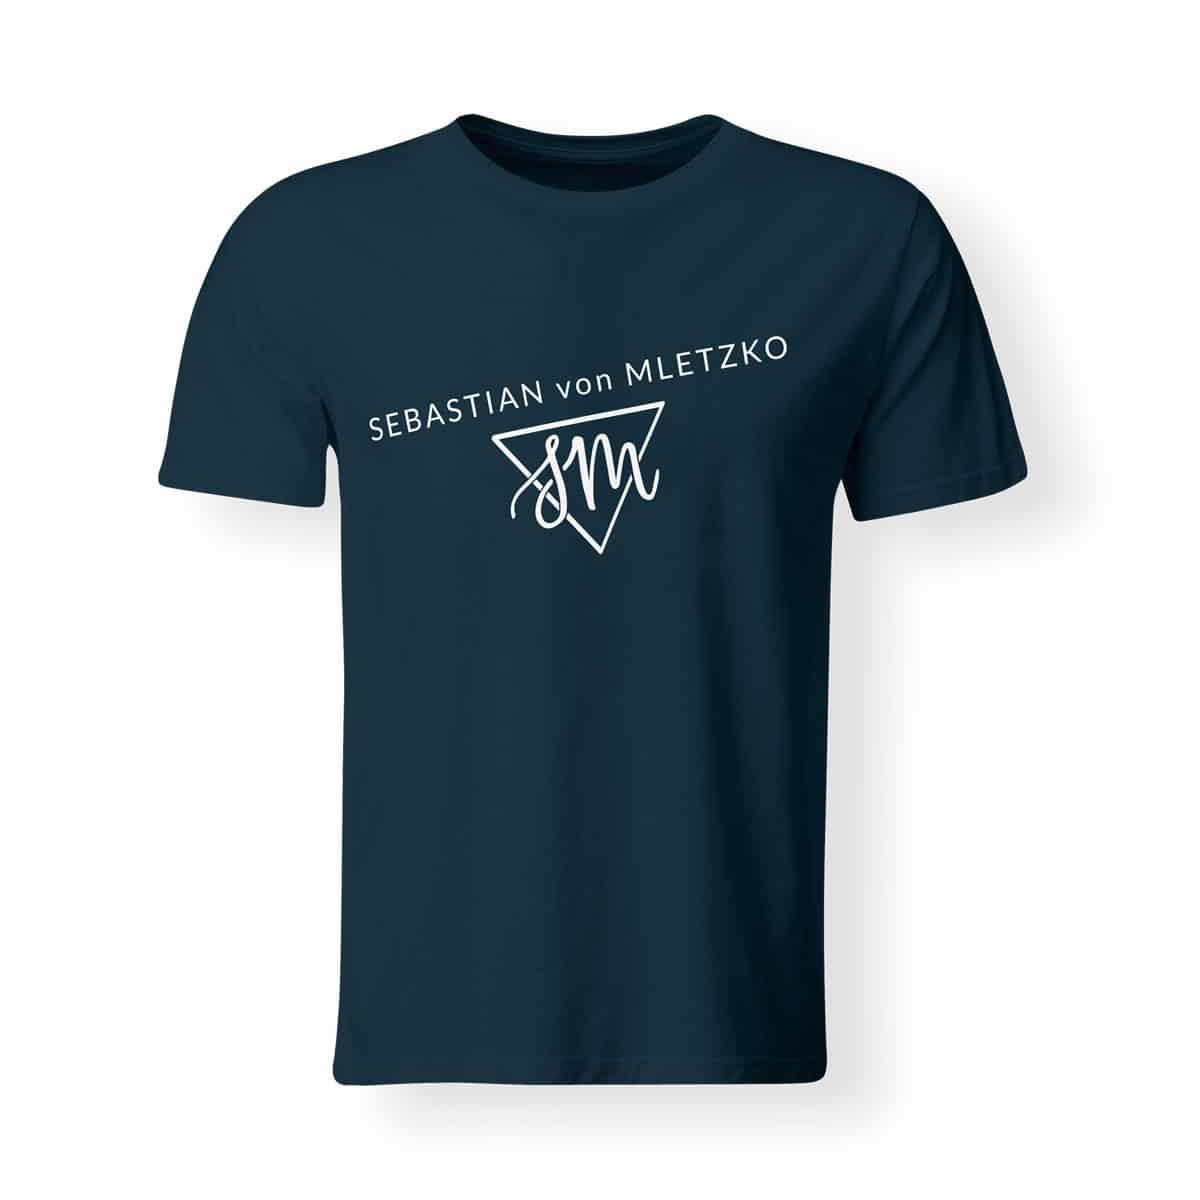 Sebastian von Mletzko T-Shirt Herren navy